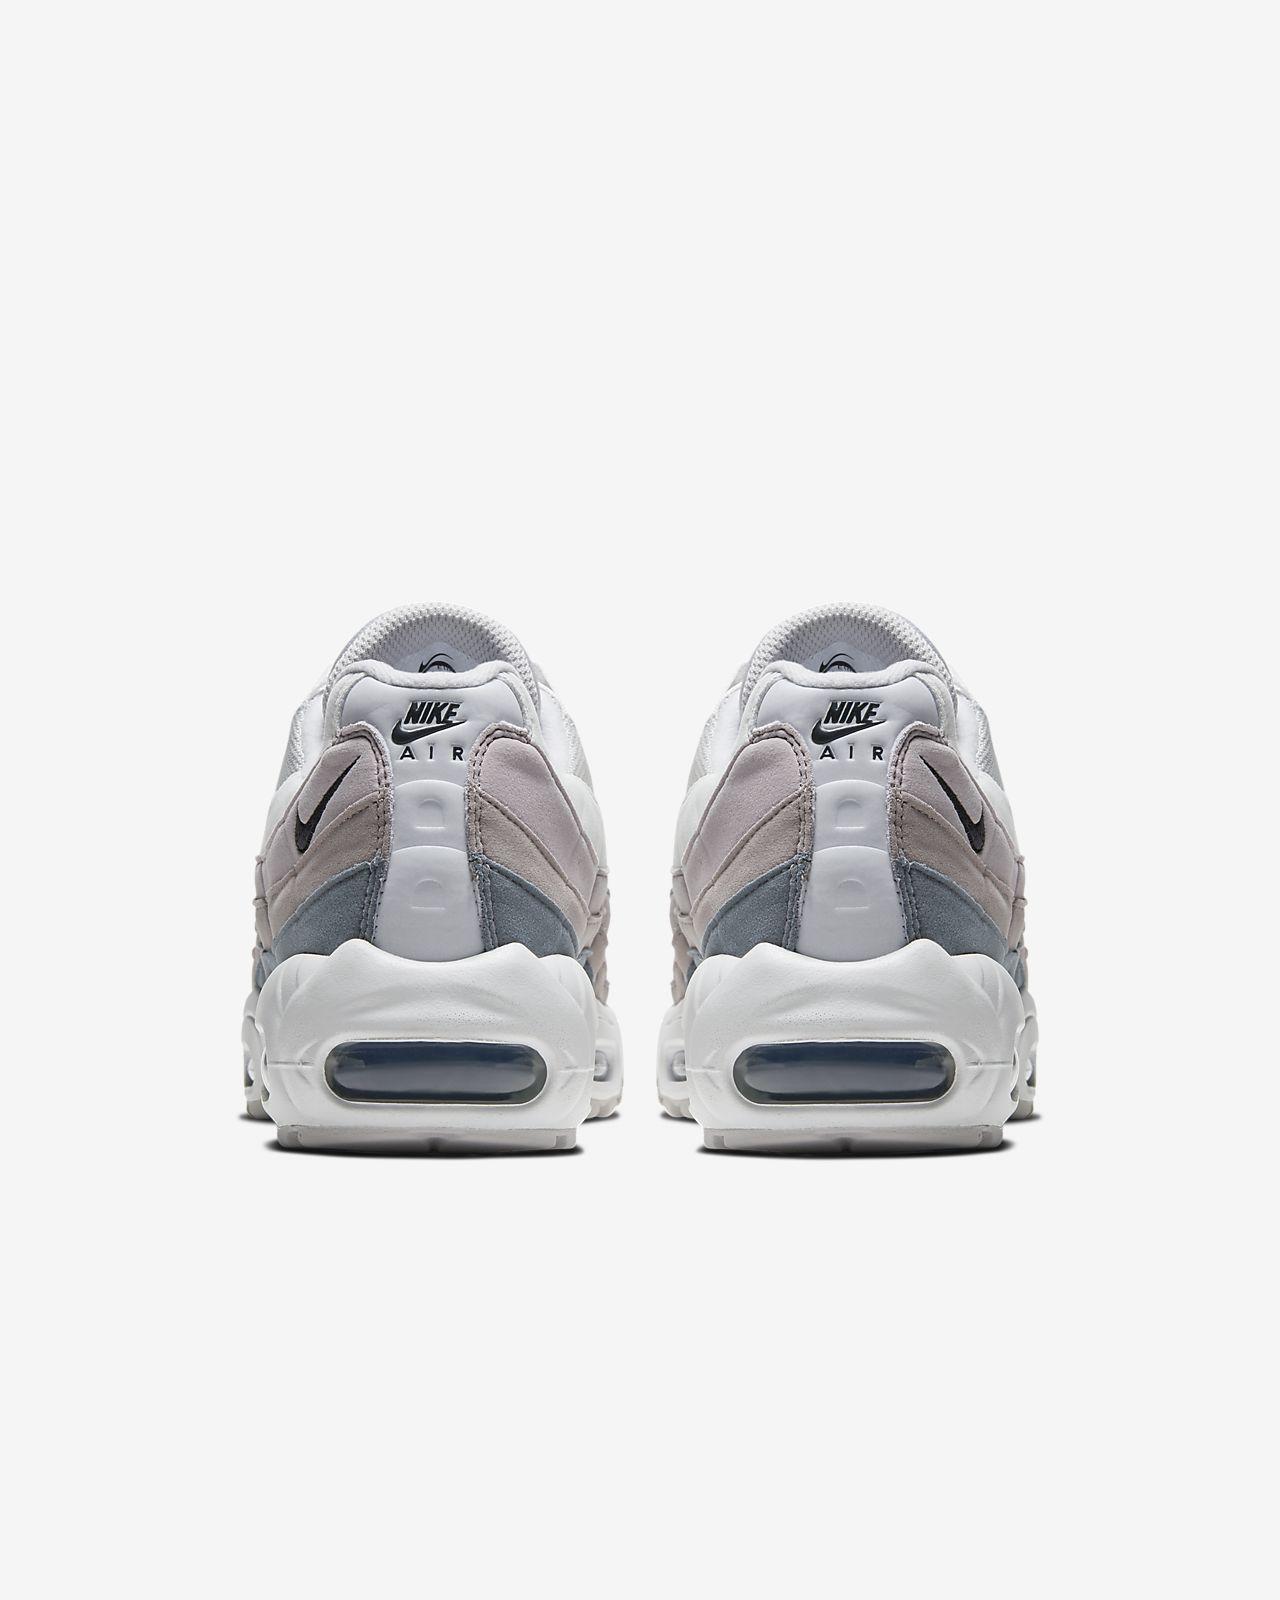 the best attitude d351e 985f8 ... Chaussure Nike Air Max 95 pour Femme